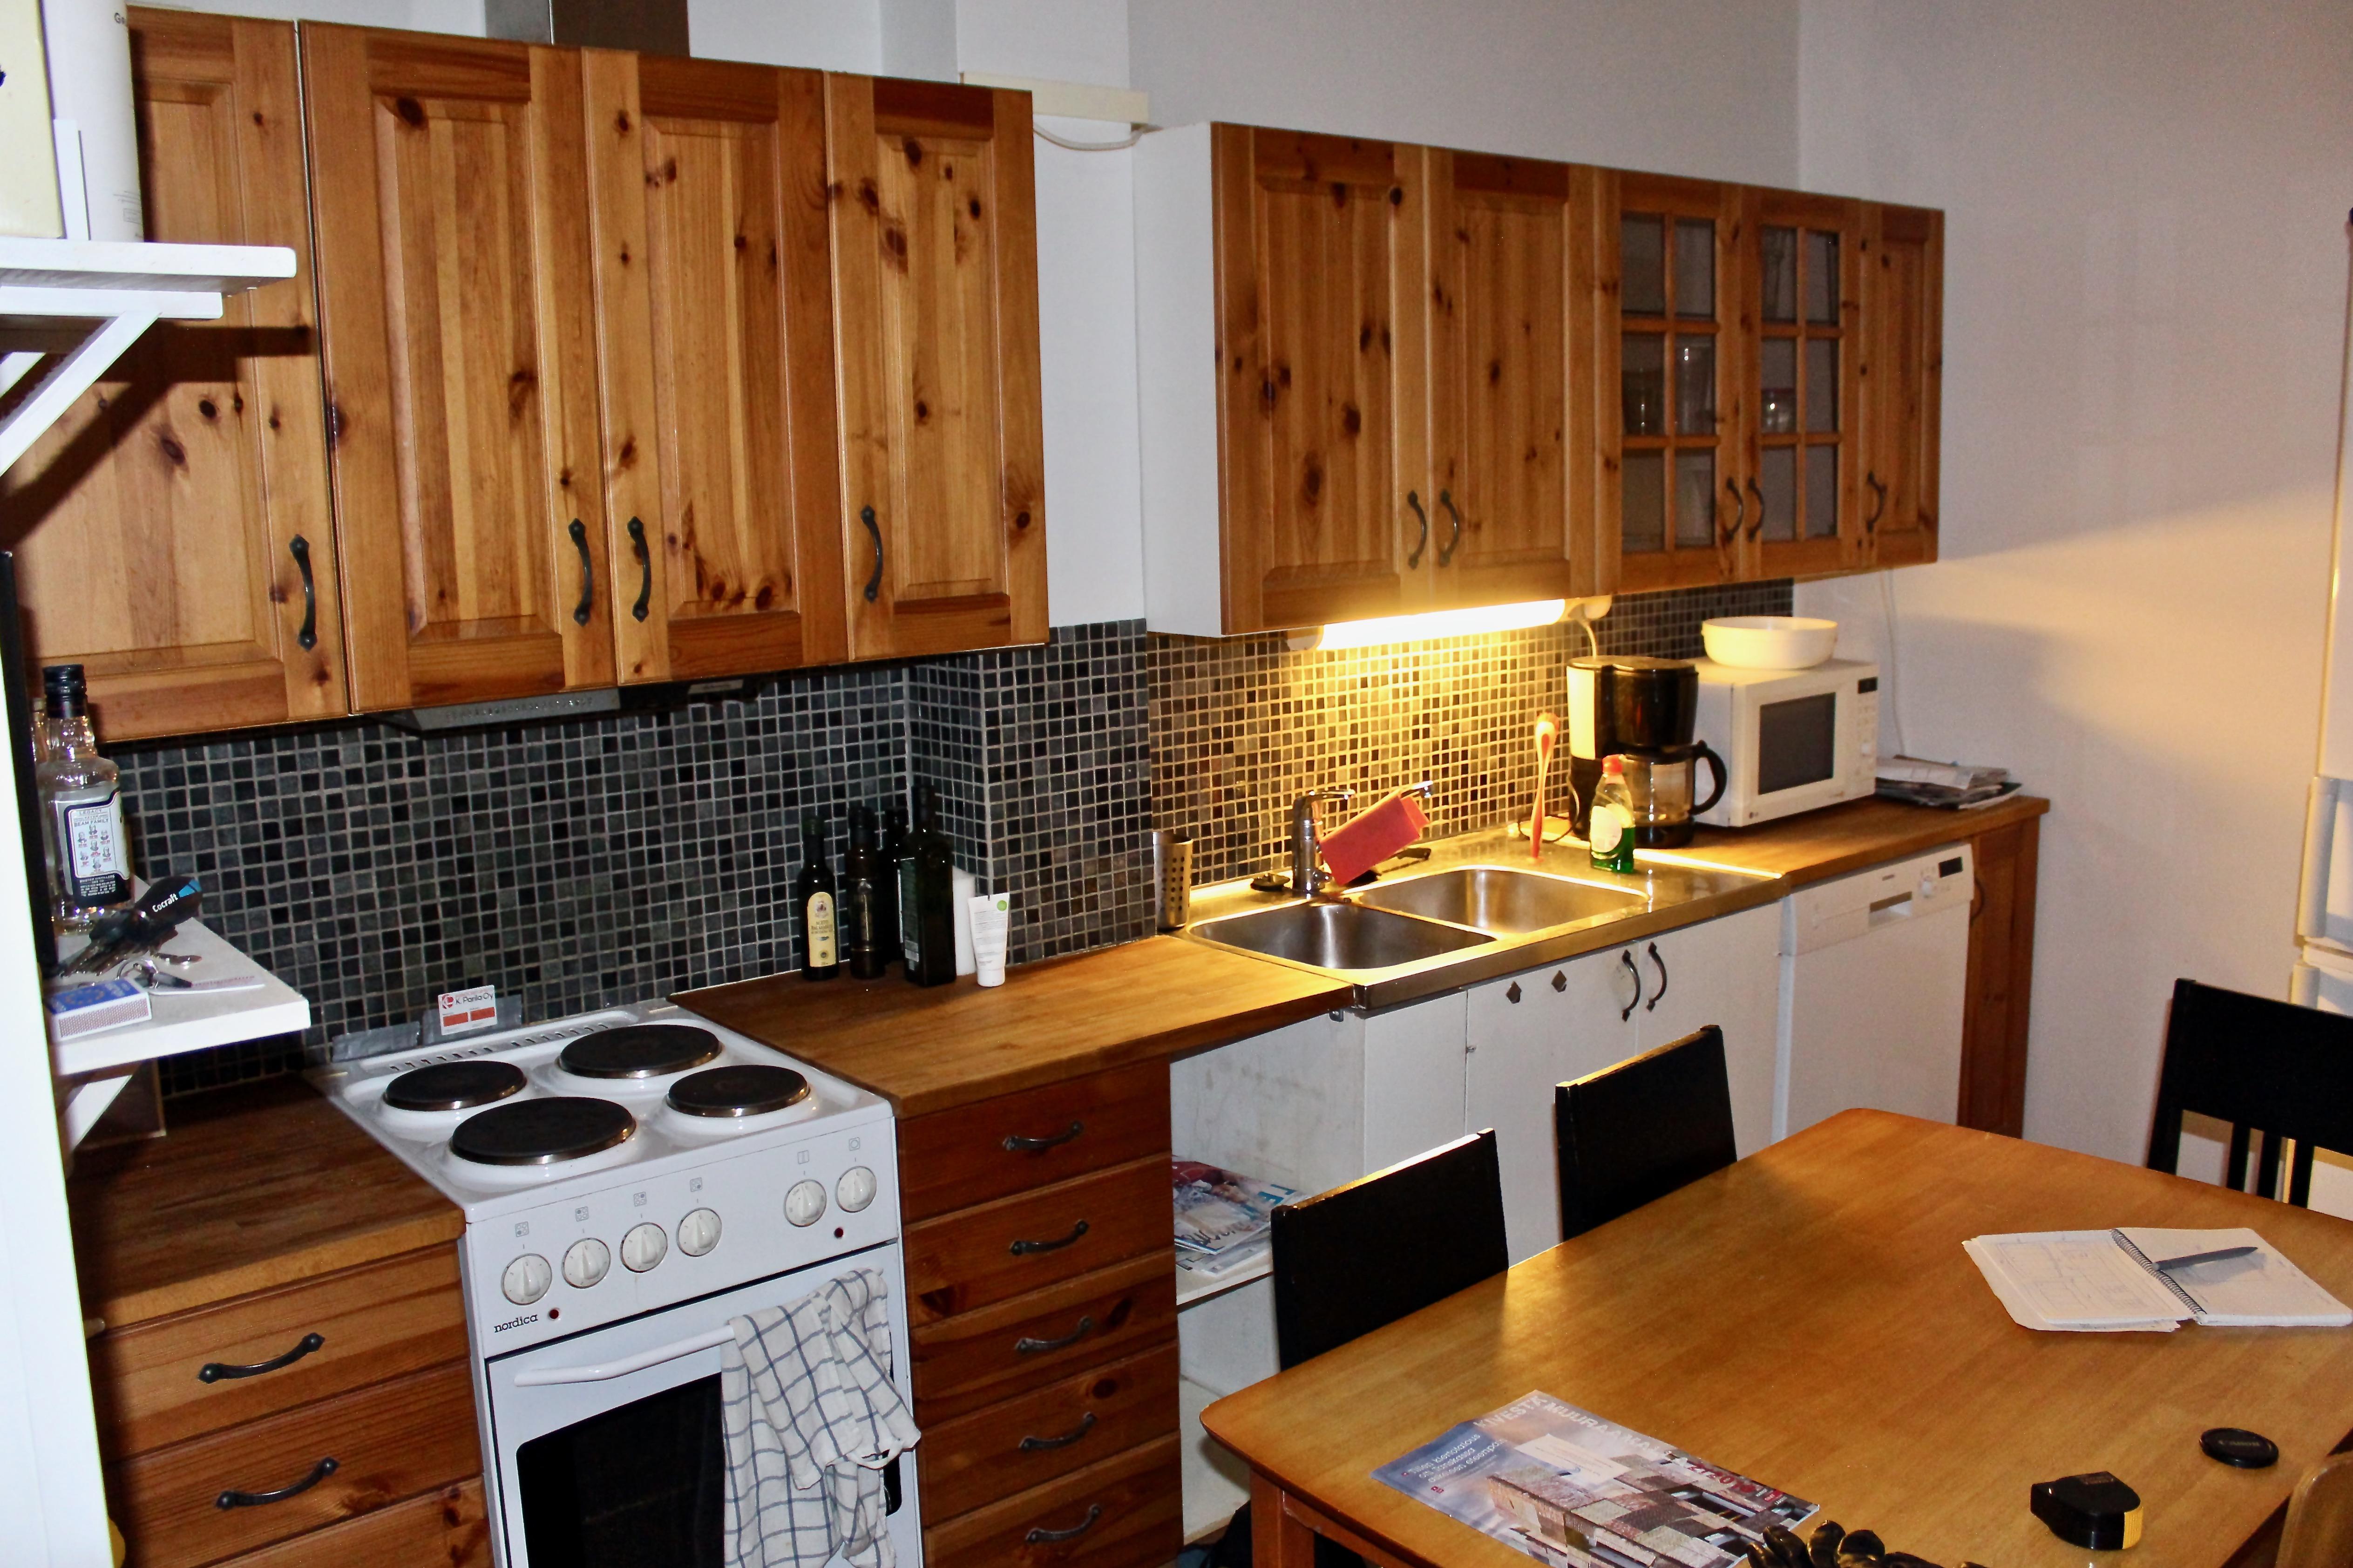 Uusi keittiö before & after